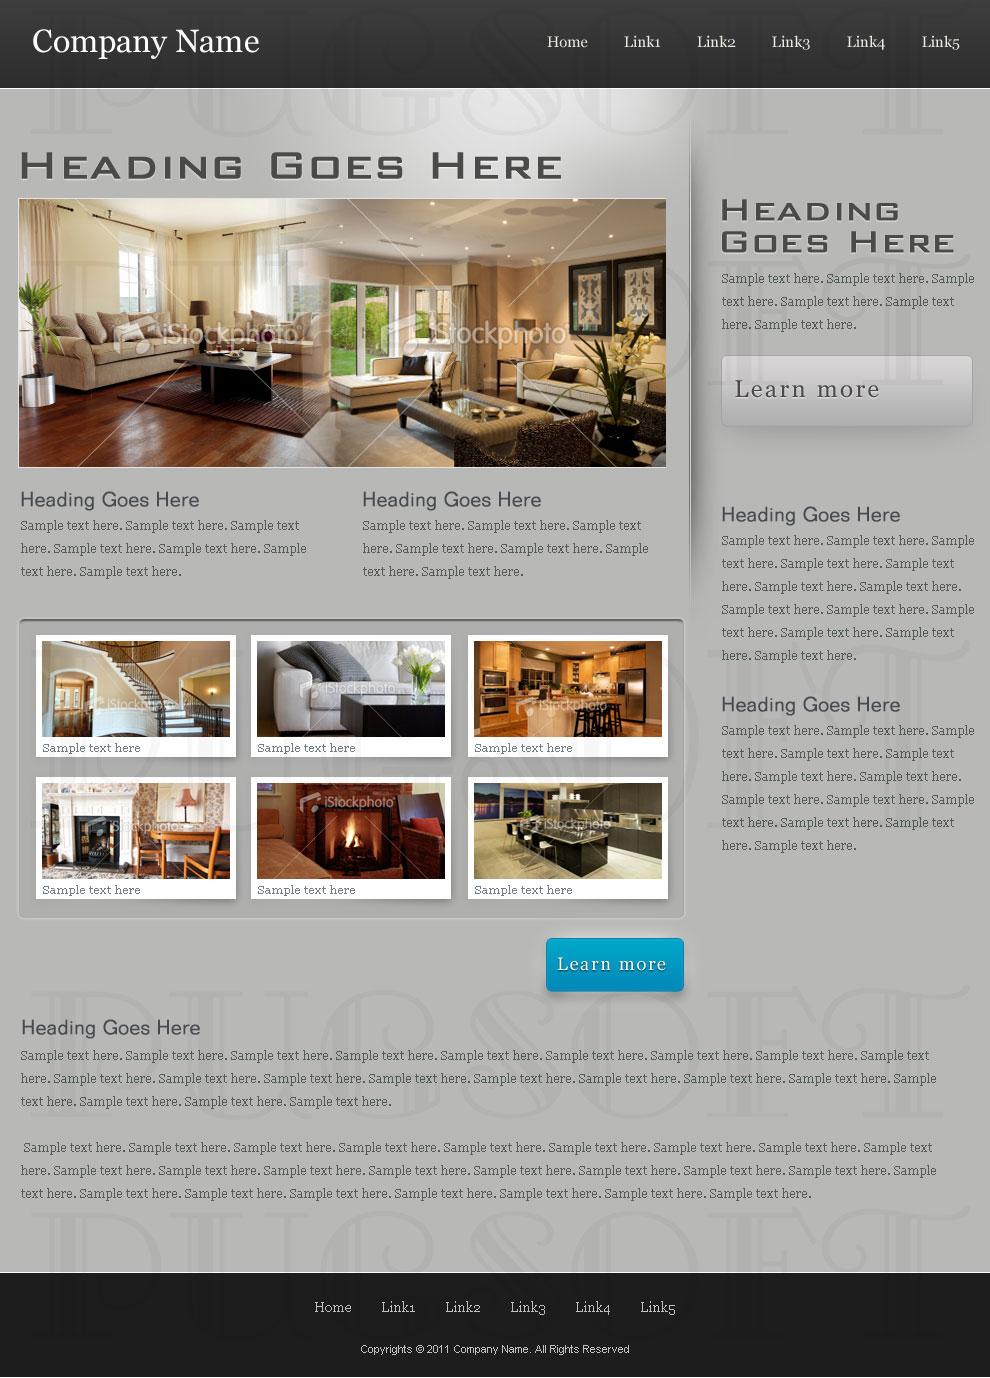 Interior Design 10 Pugsoft Onlinepugsoft Online